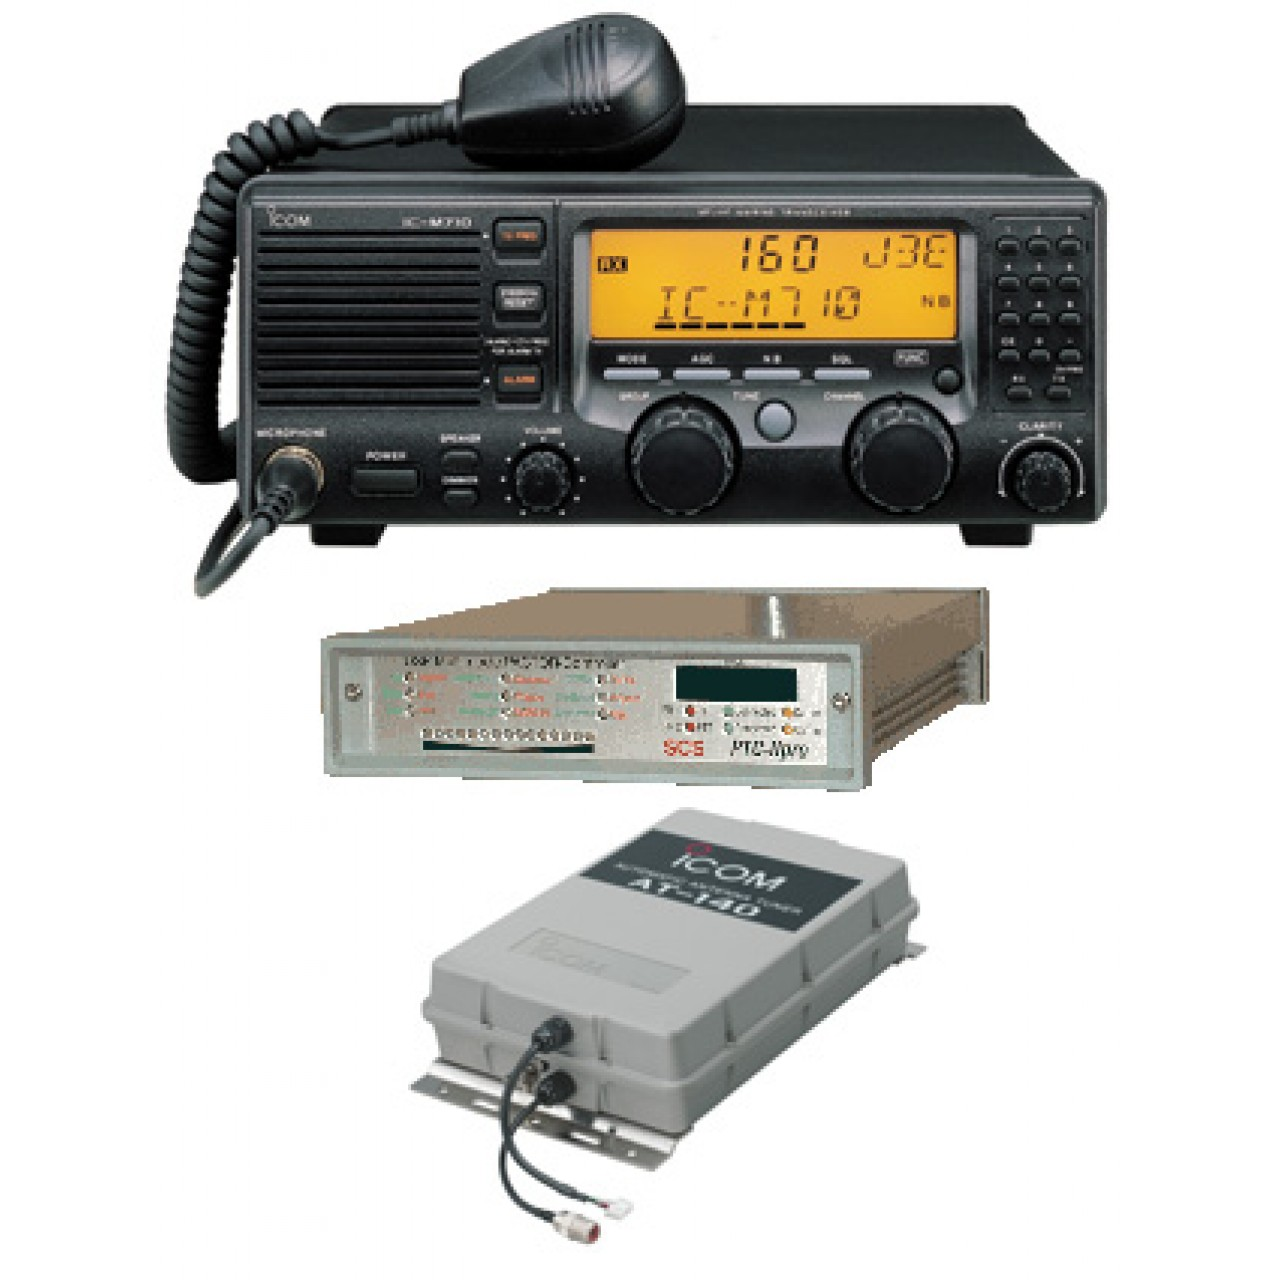 PACK-MAILM710 BLU - ICOM